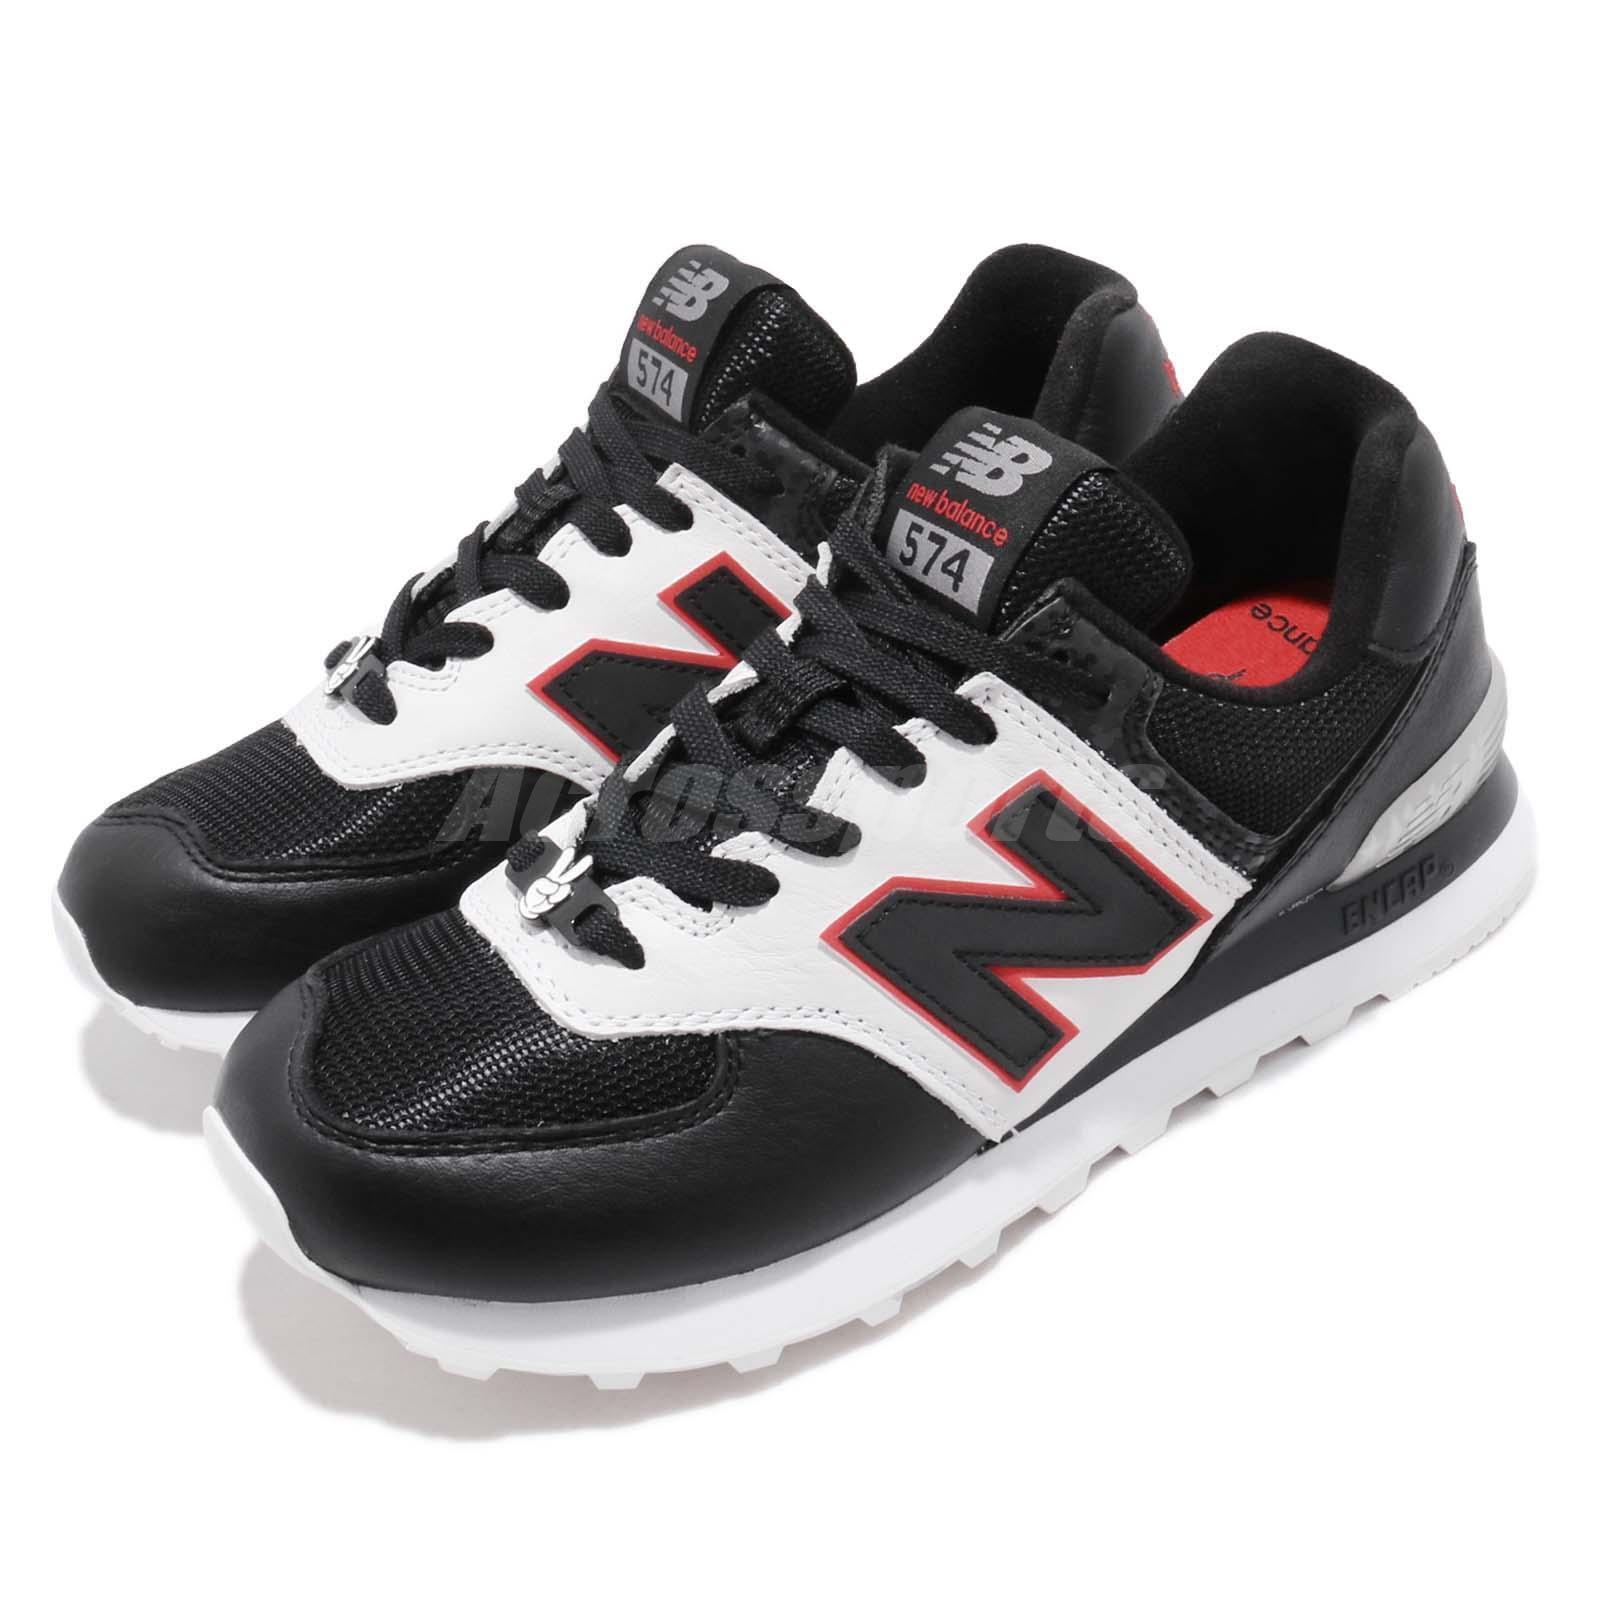 New Balance ML574DSA D Disney Disney Disney nero bianca rosso Men Running scarpe scarpe da ginnastica ML574DSAD | Vendite Online  | Scolaro/Signora Scarpa  fc4442